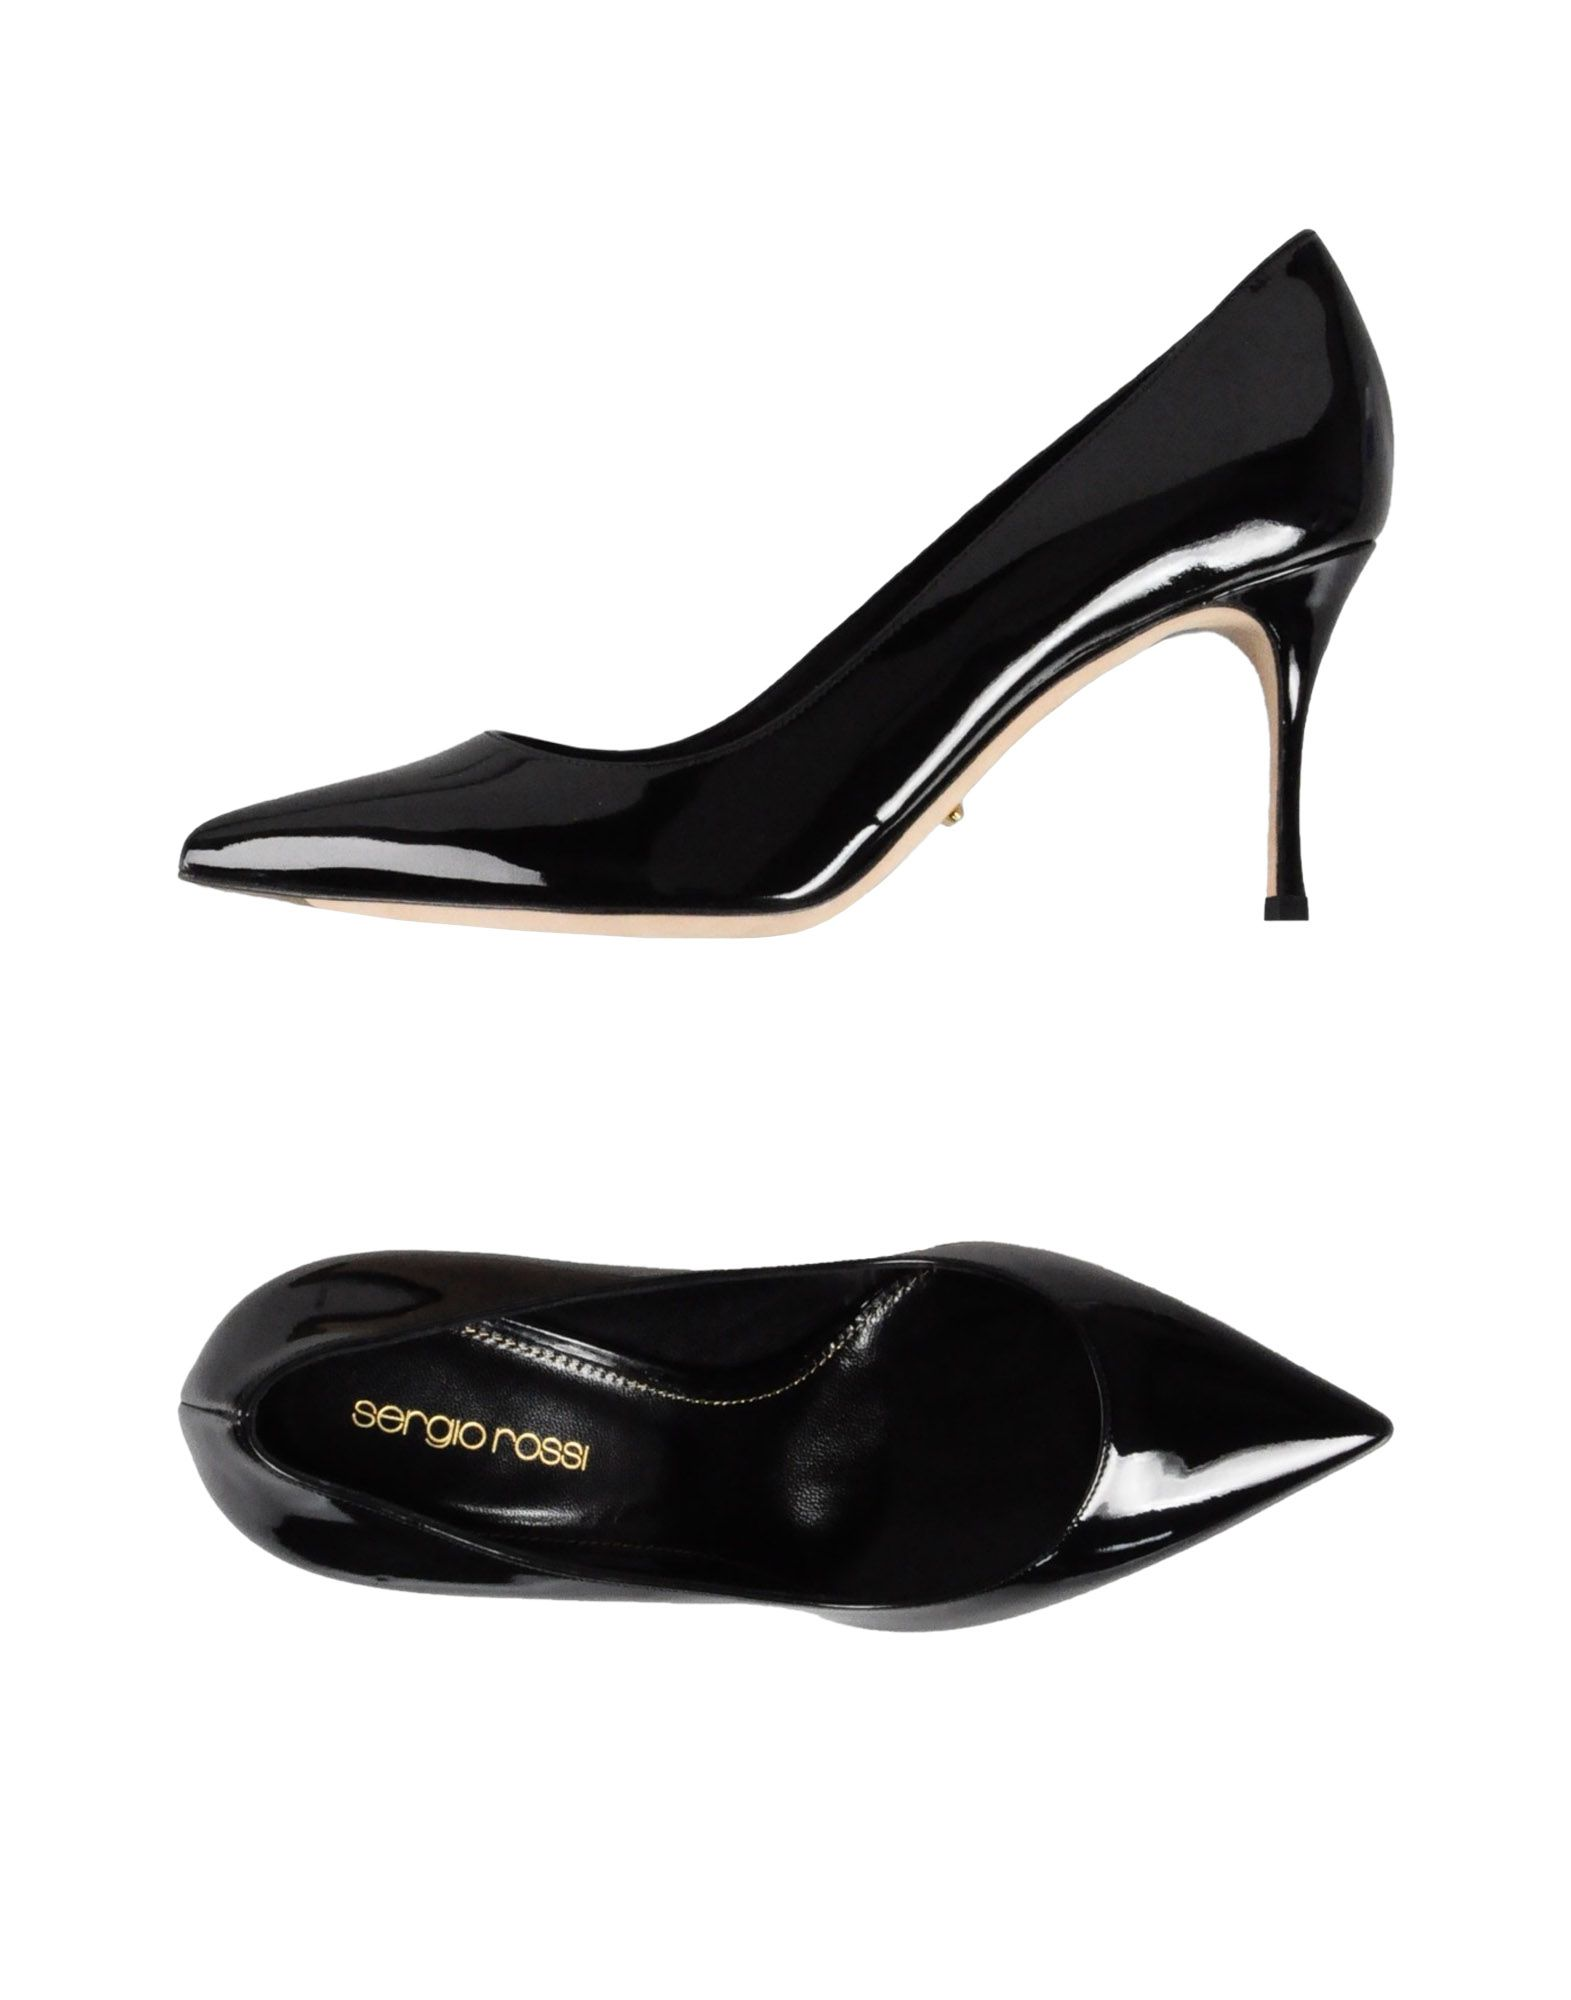 Escarpins Sergio Rossi Femme - Escarpins Sergio Rossi Noir Chaussures casual sauvages